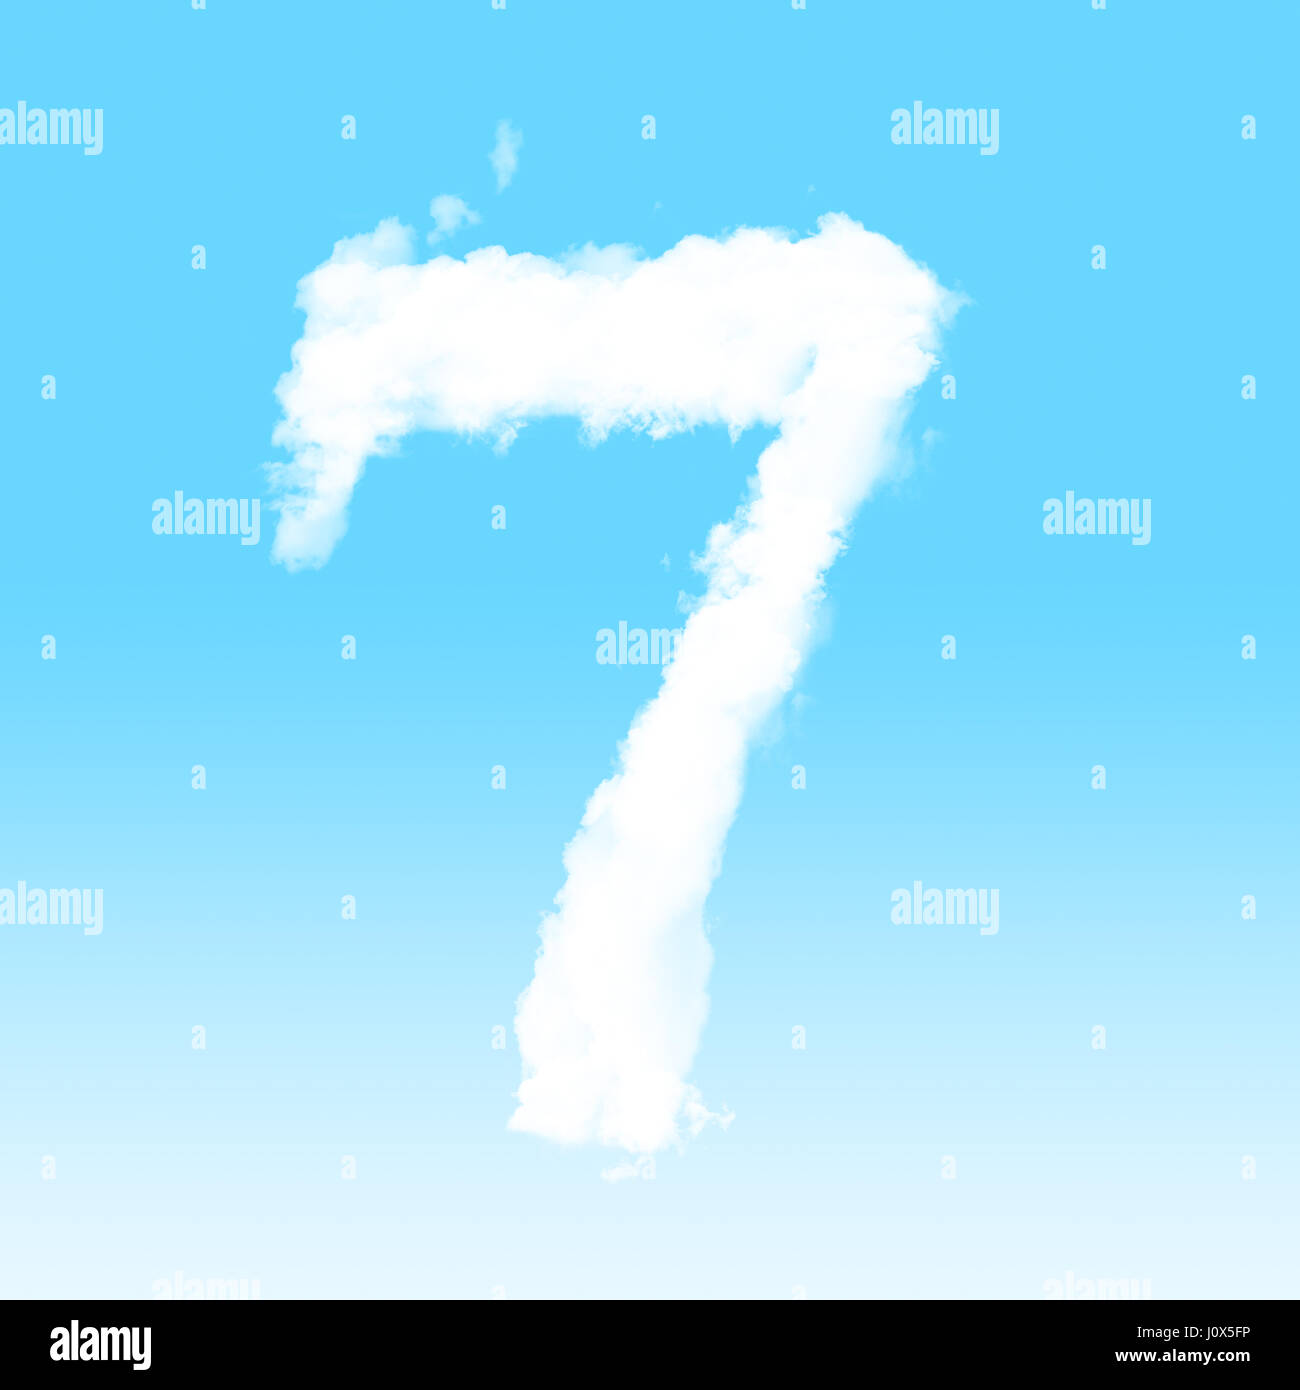 Number cloud alphabet font at sky background - Stock Image